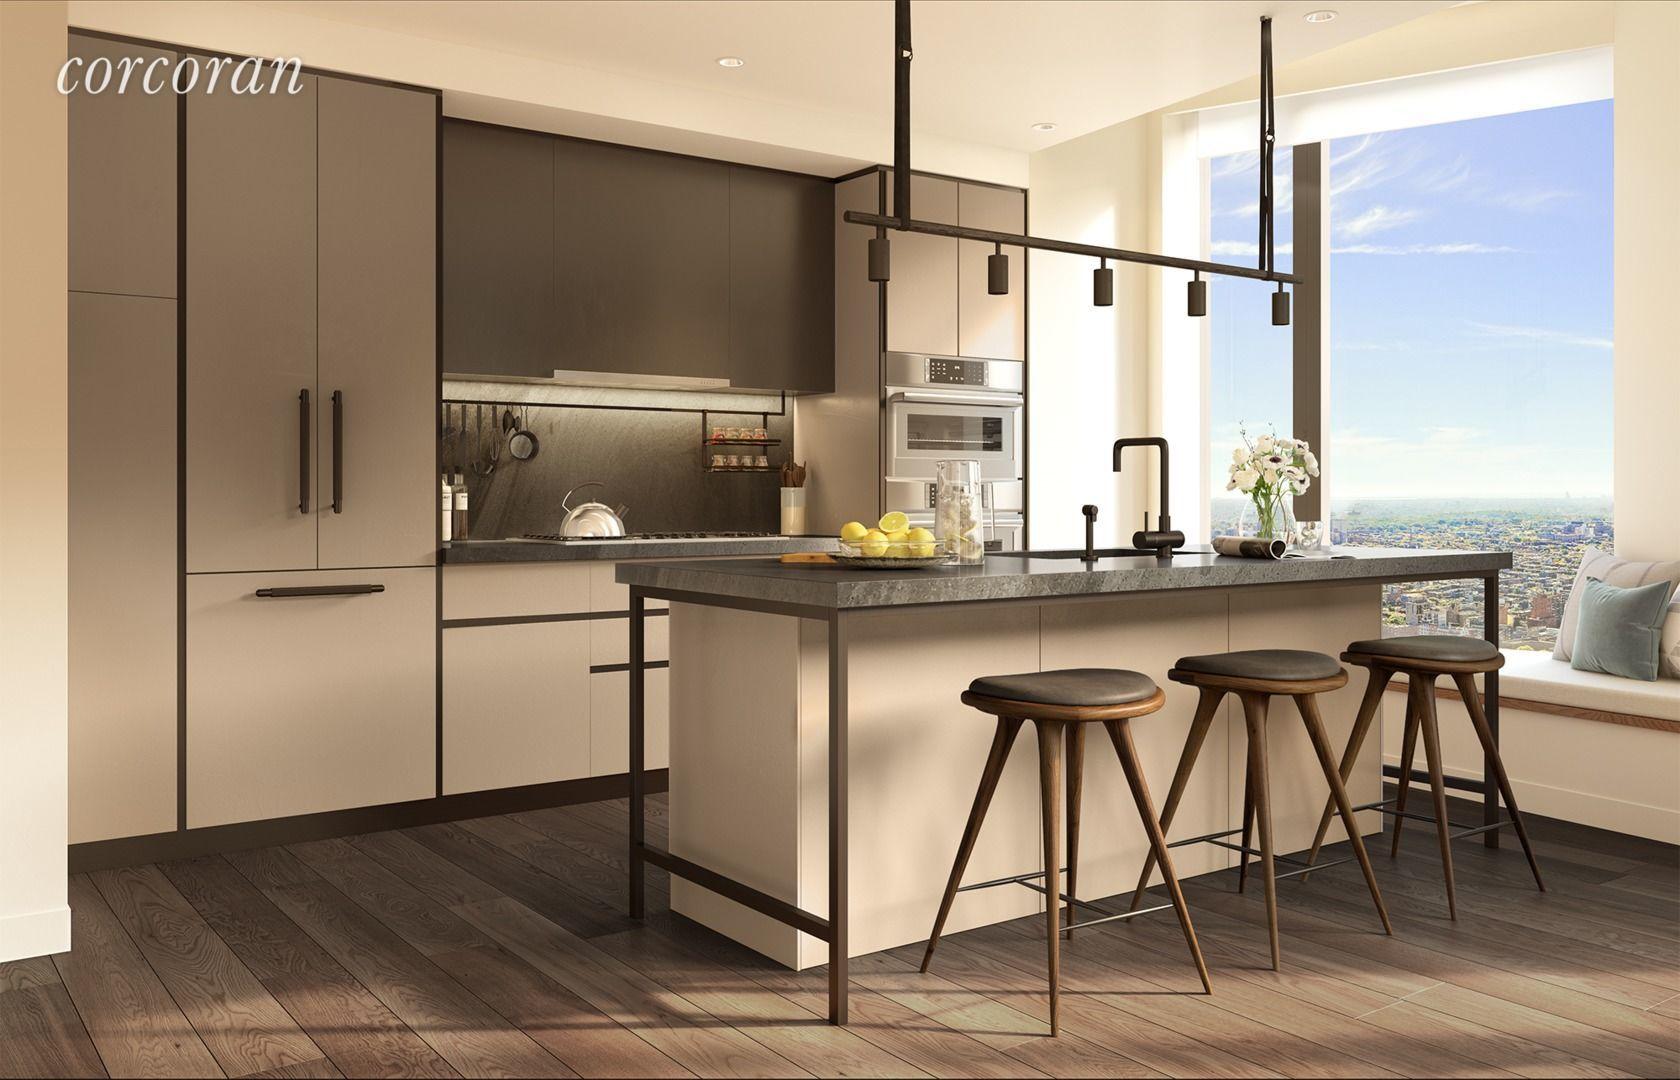 Apartment for sale at 11 Hoyt Street, Apt 5D